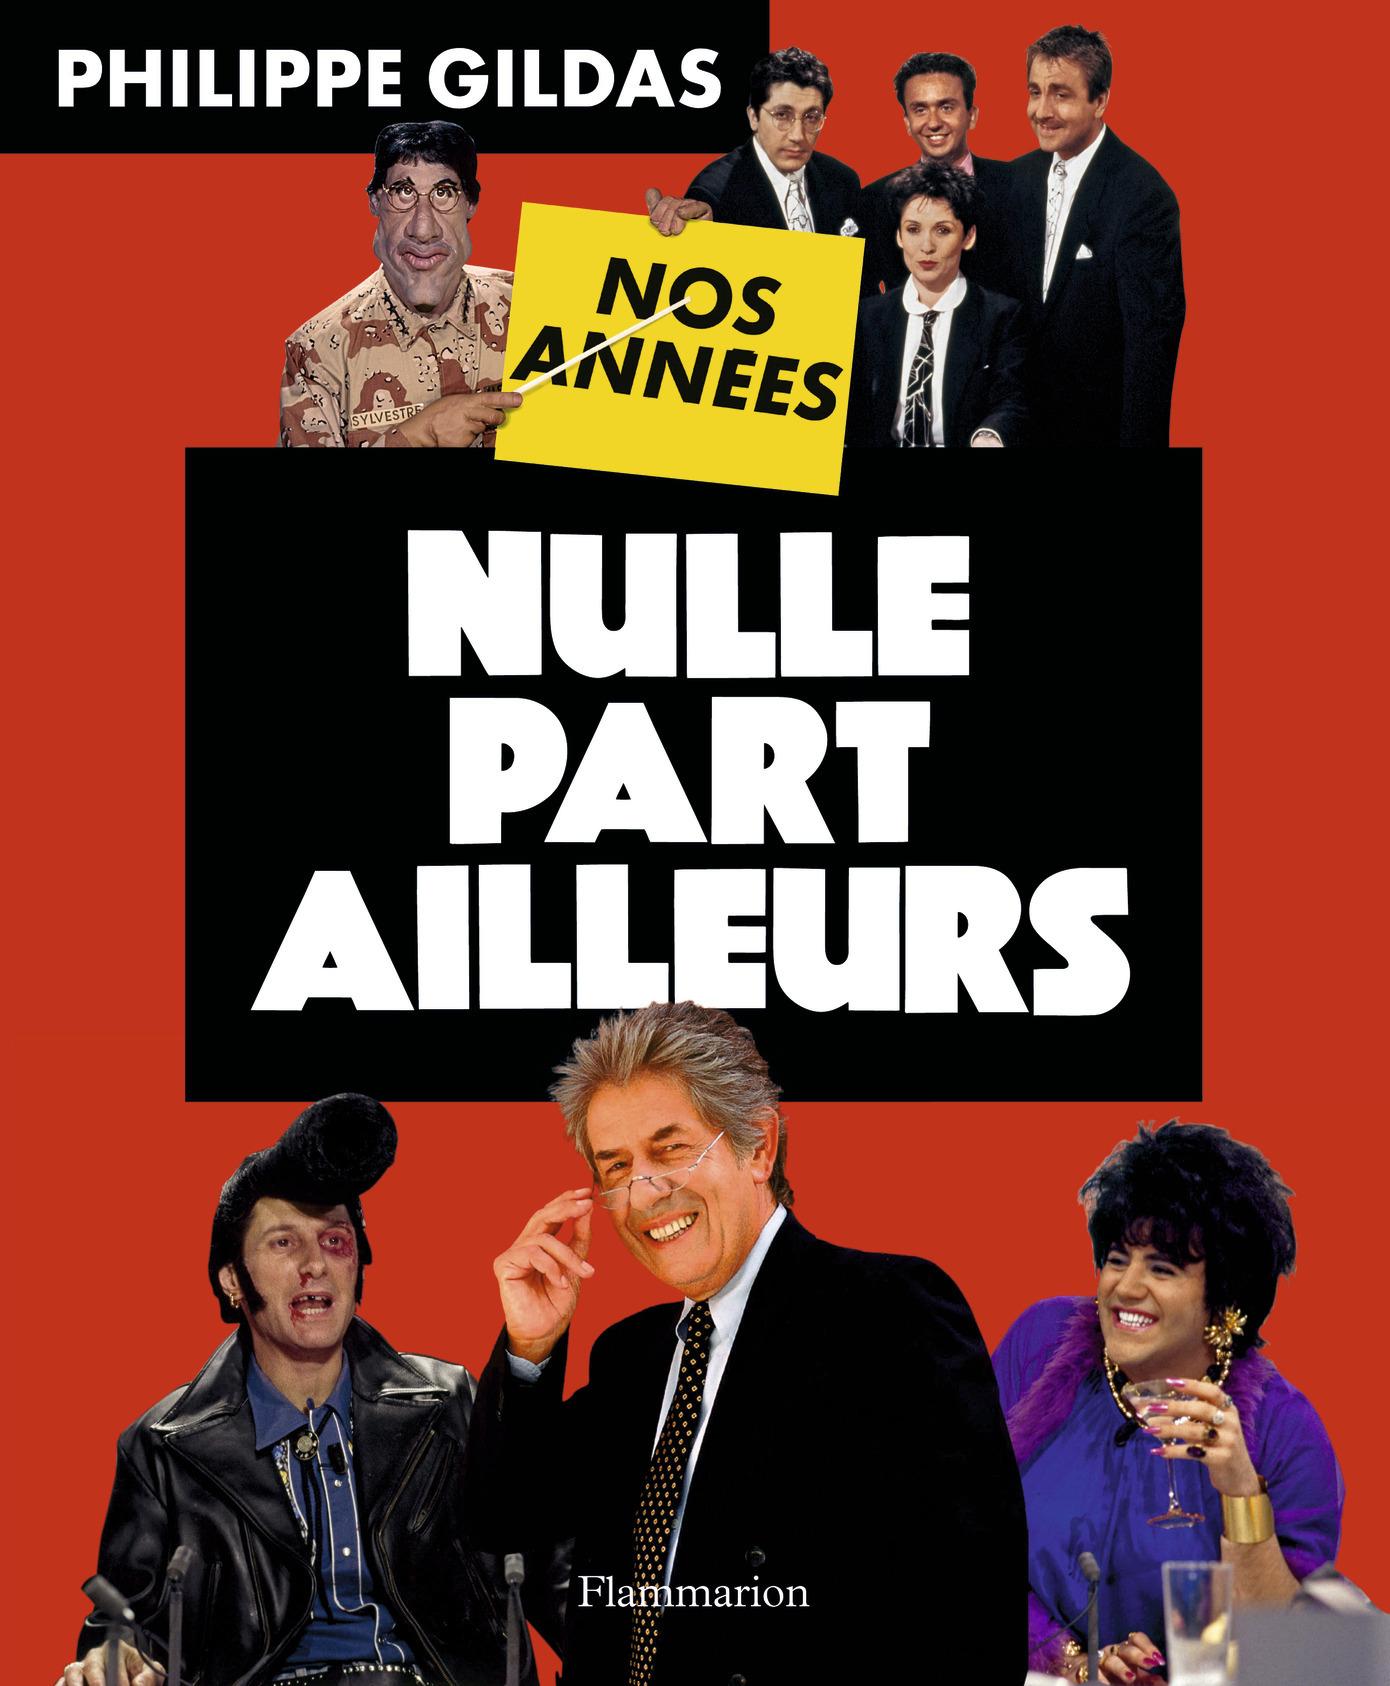 NOS ANNEES NULLE PART AILLEURS